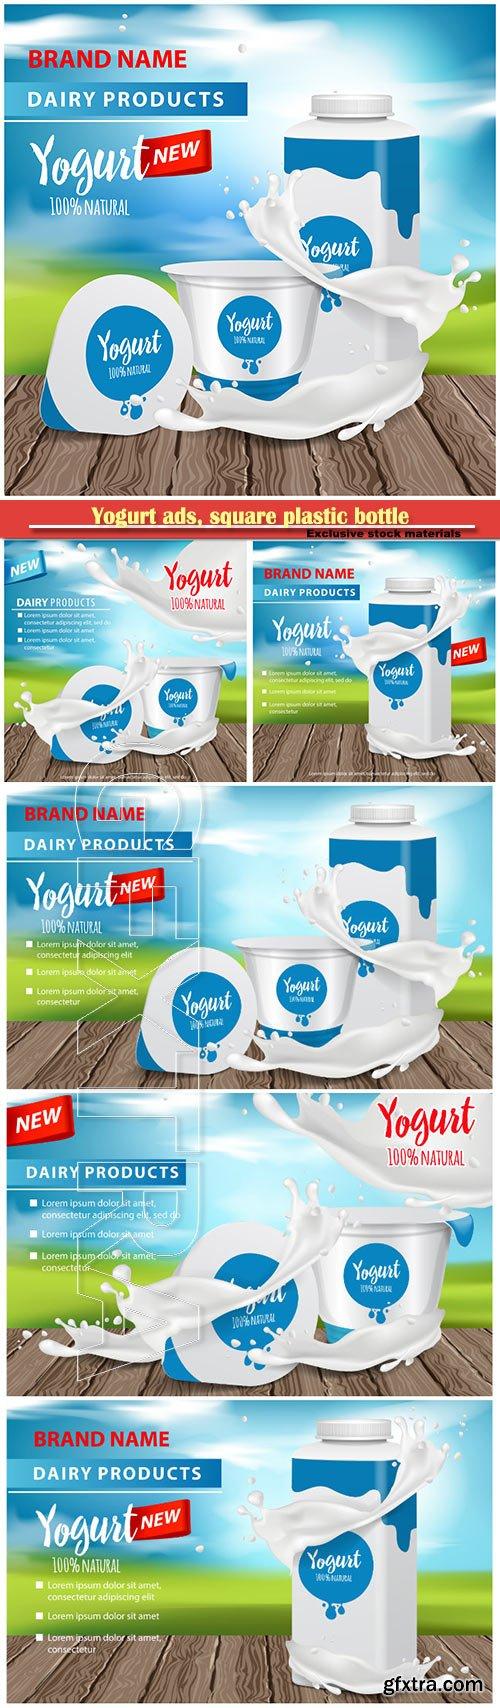 Yogurt ads, square plastic bottle and round pot with yogurt splash , 3d vector illustration for web or magazine